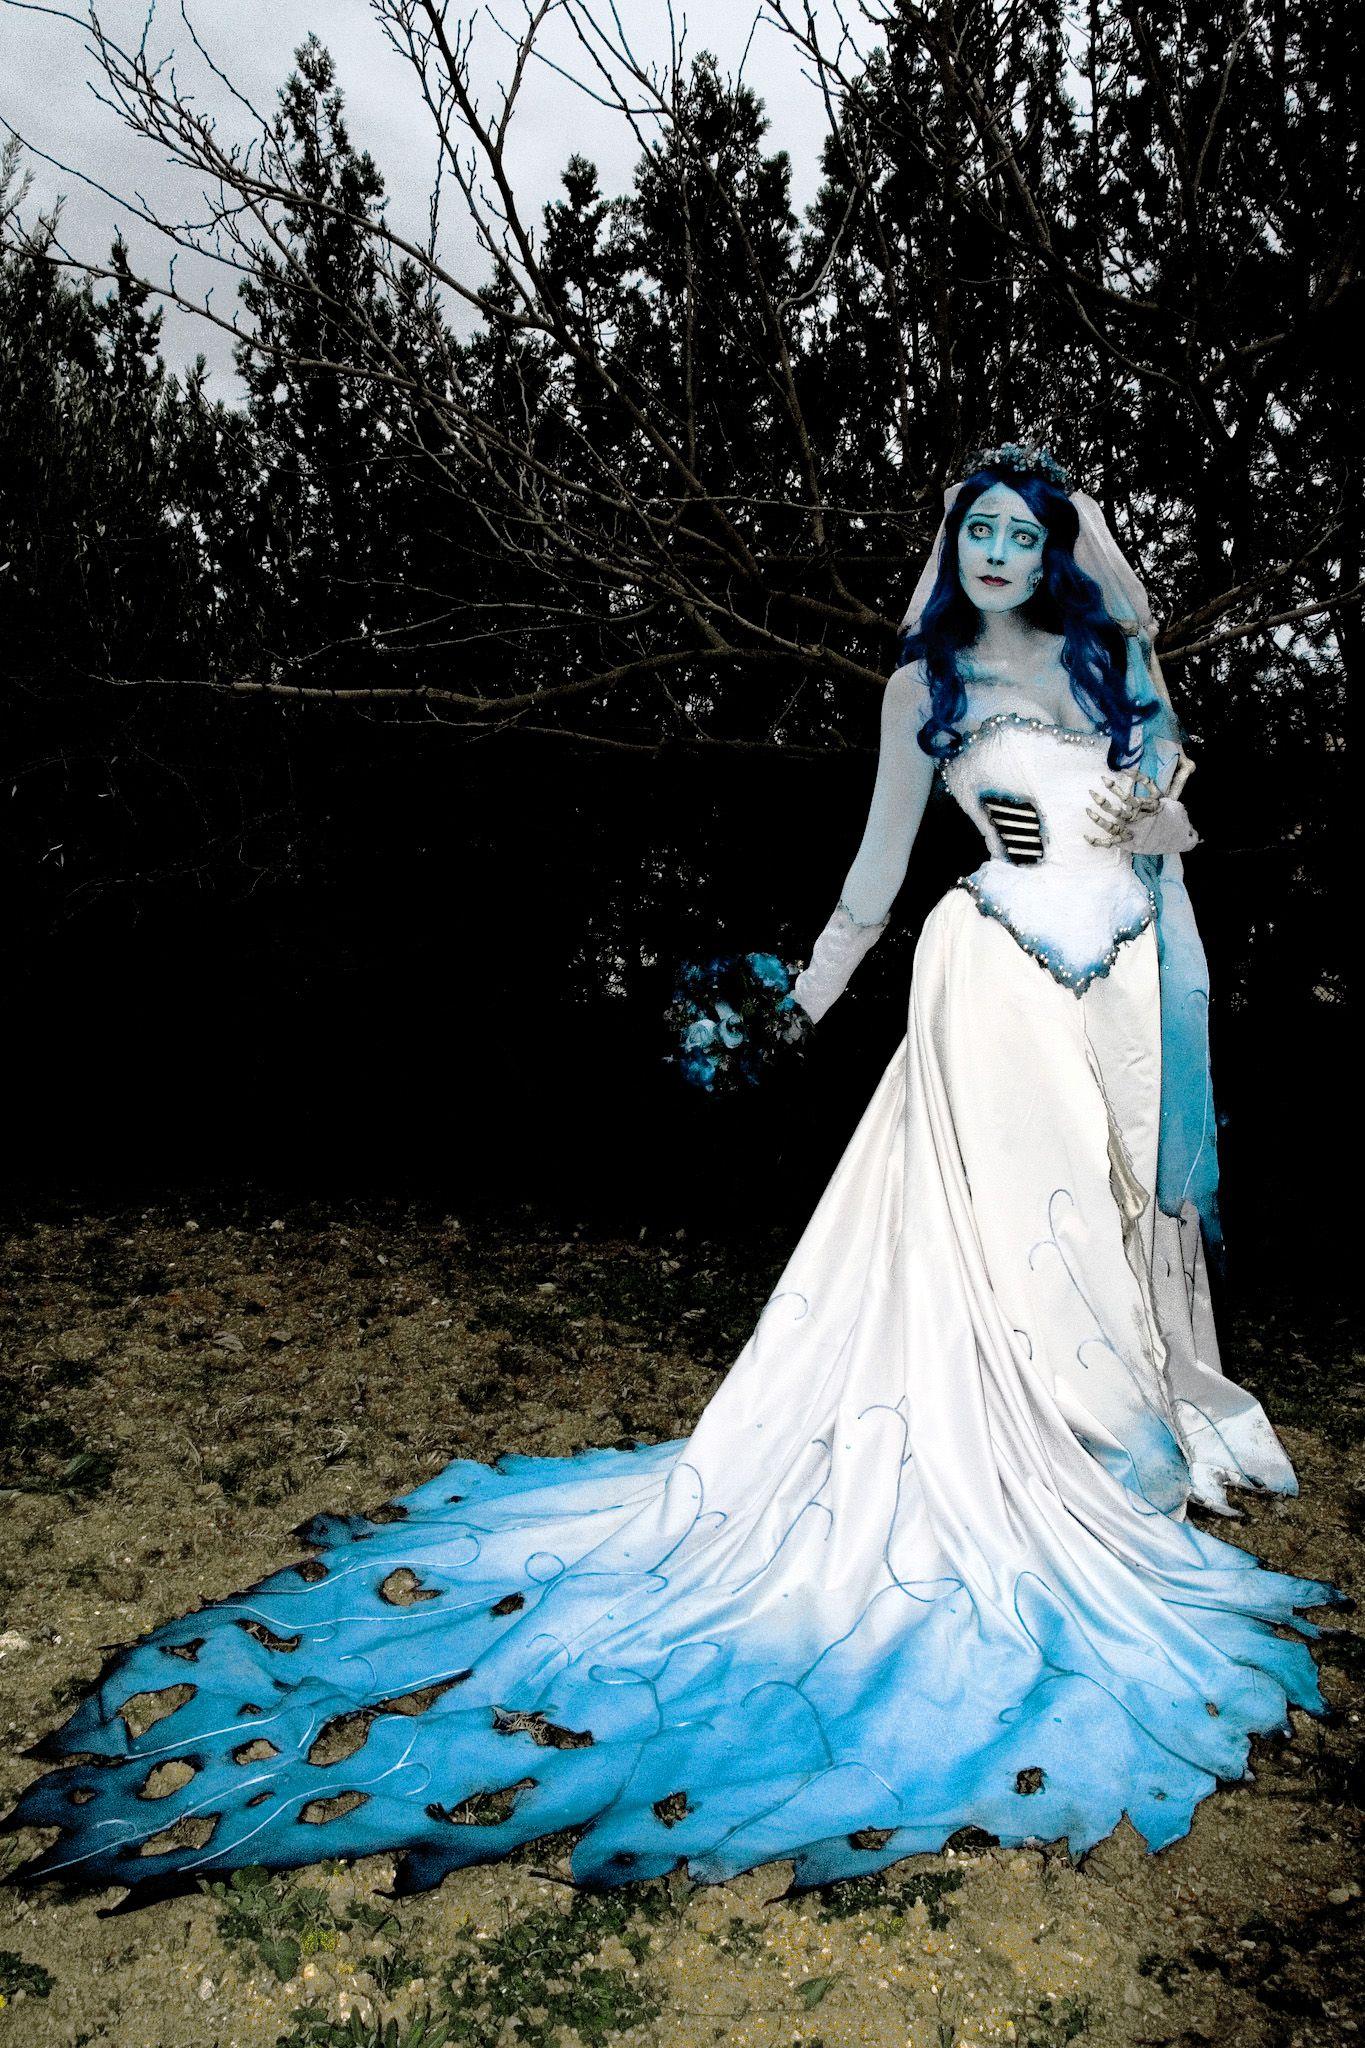 An Amazing Corpse Bride Wedding Dress 12 Tim Burton Corpse - Corpse Bride Inspired Wedding Dress